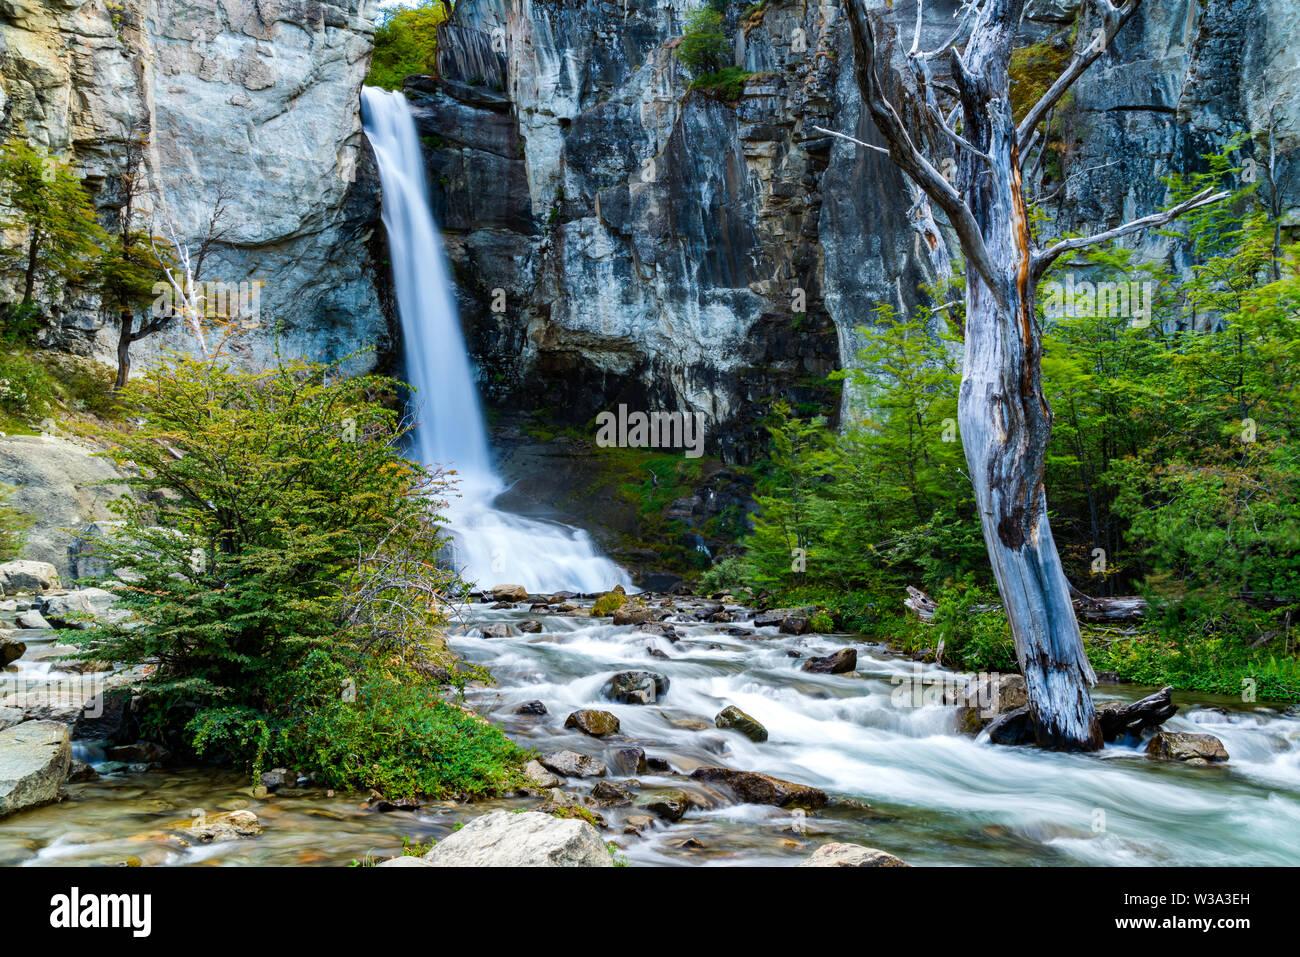 View of Chorrillo del Salto Waterfall at Los Glaciares National Park in El Chalten, Argentina - Stock Image